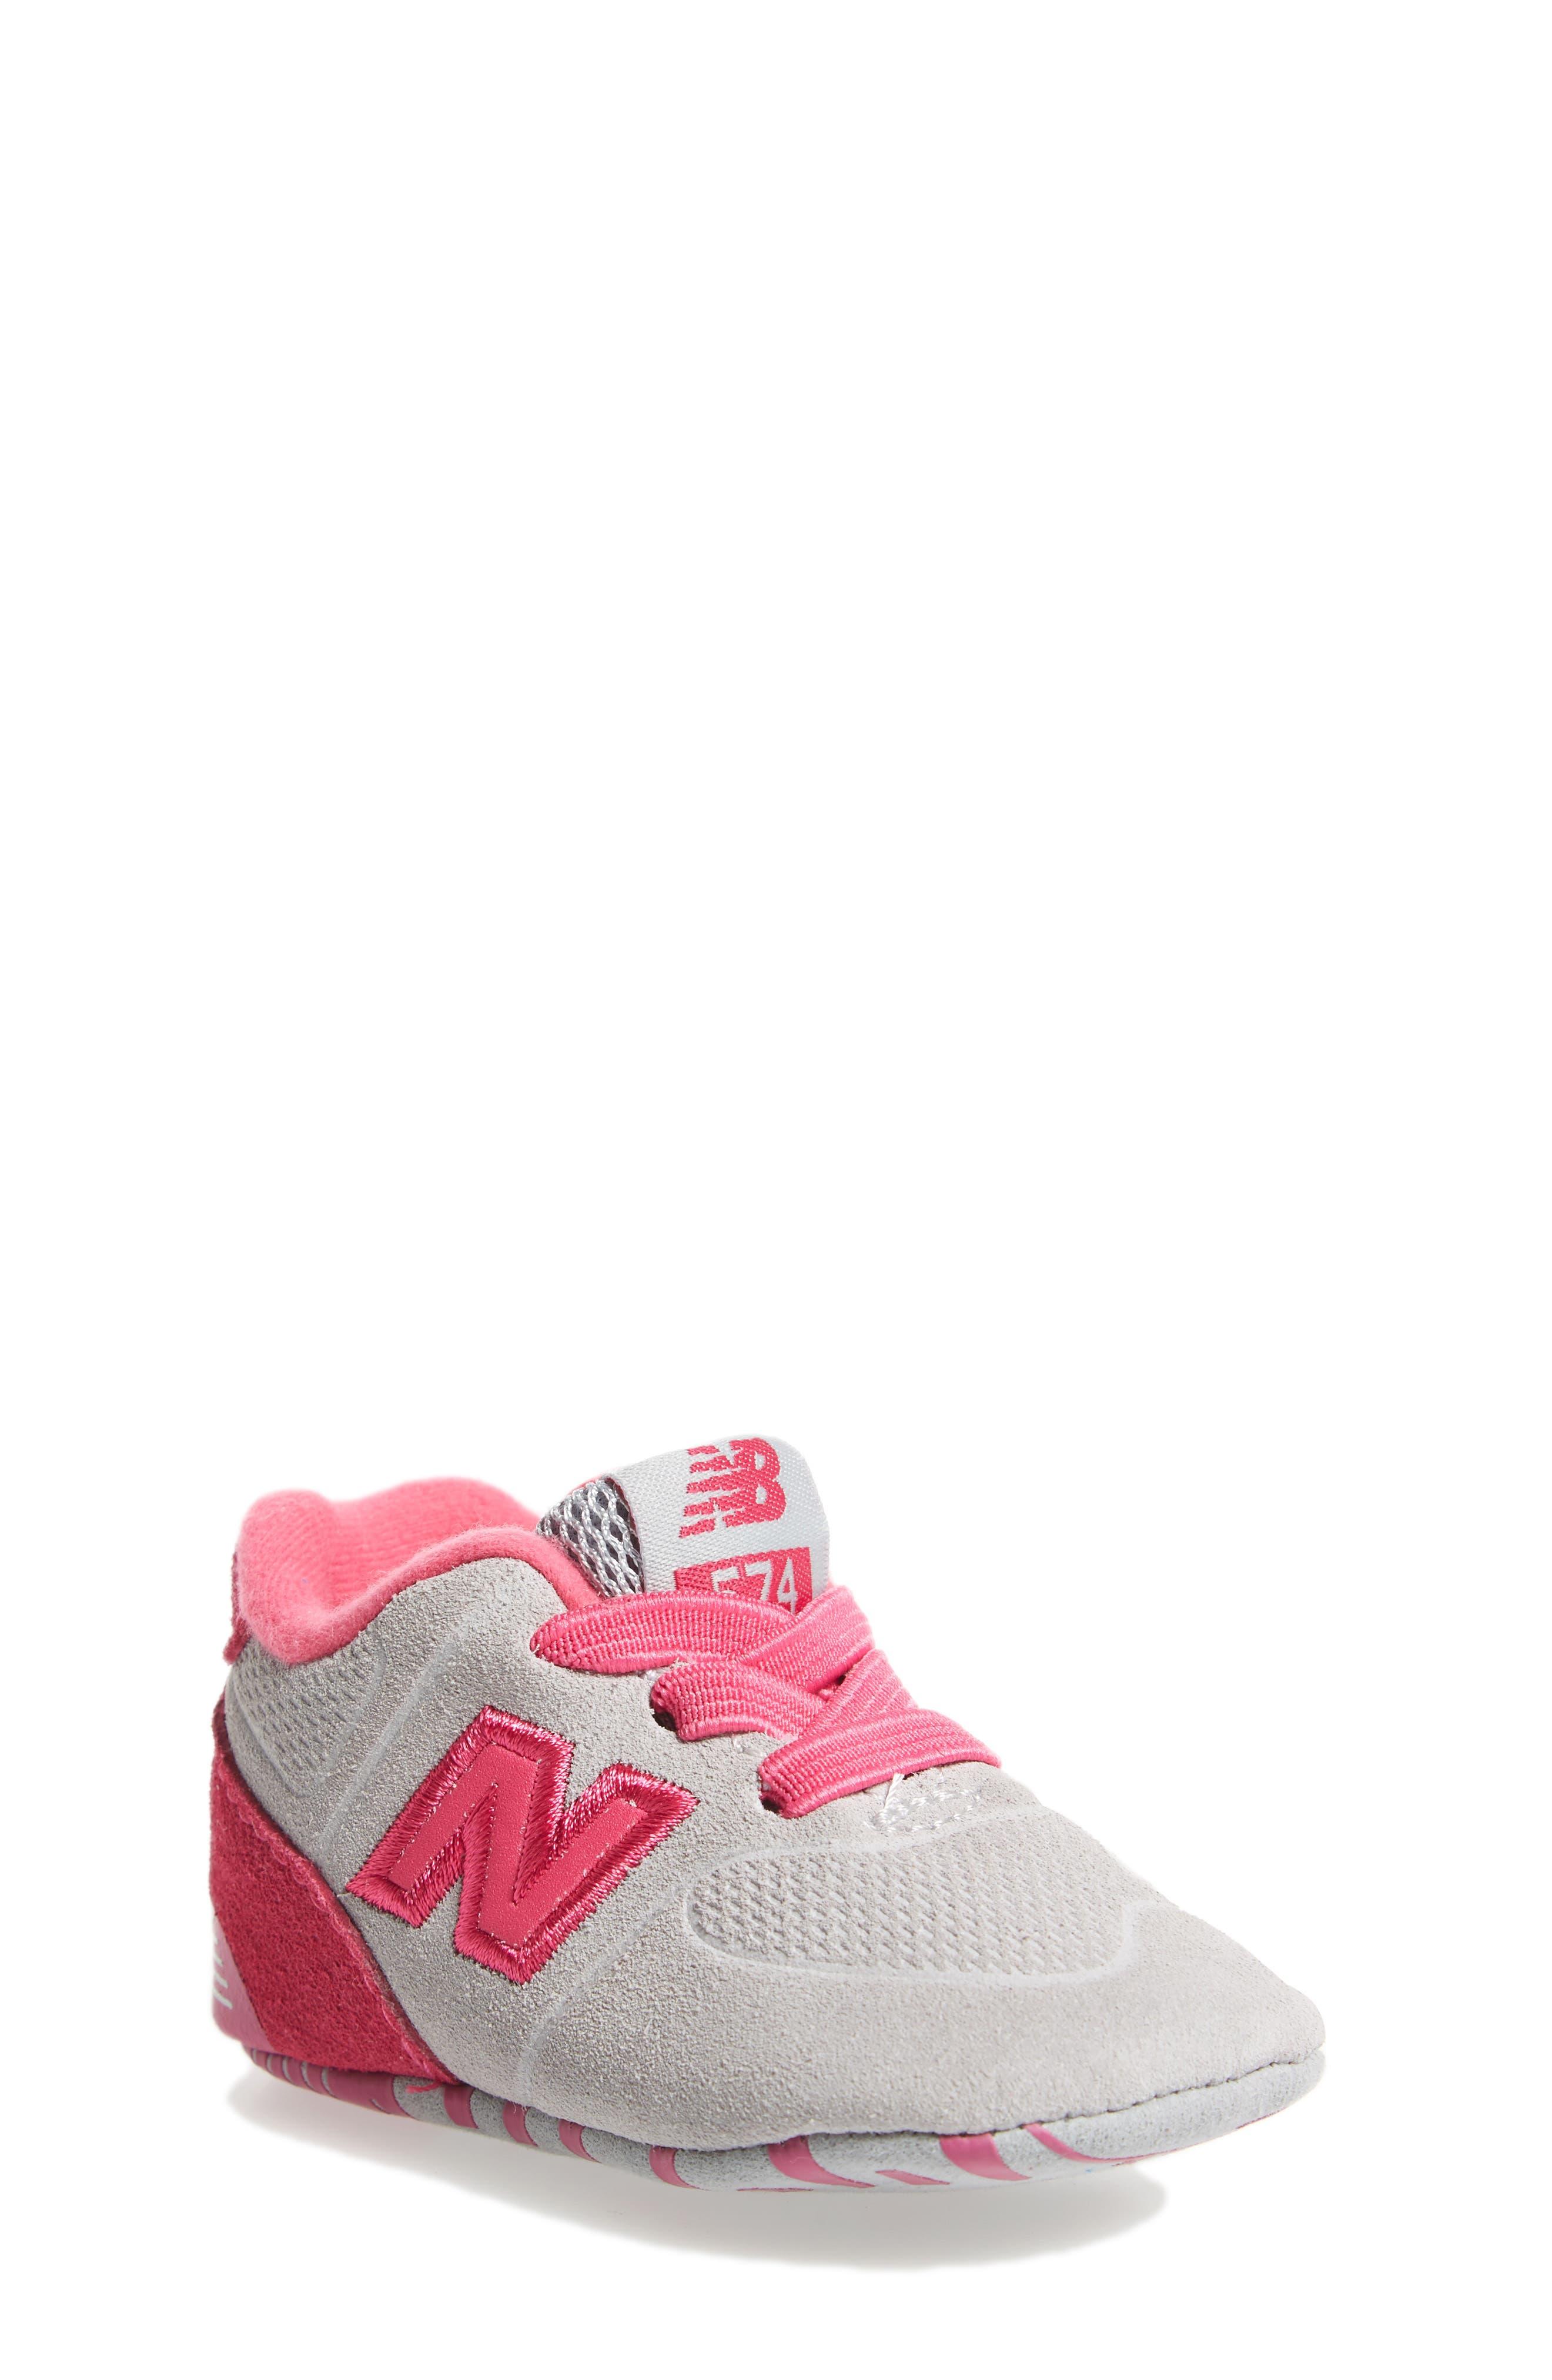 574 Crib Shoe,                         Main,                         color, Pink/ Grey